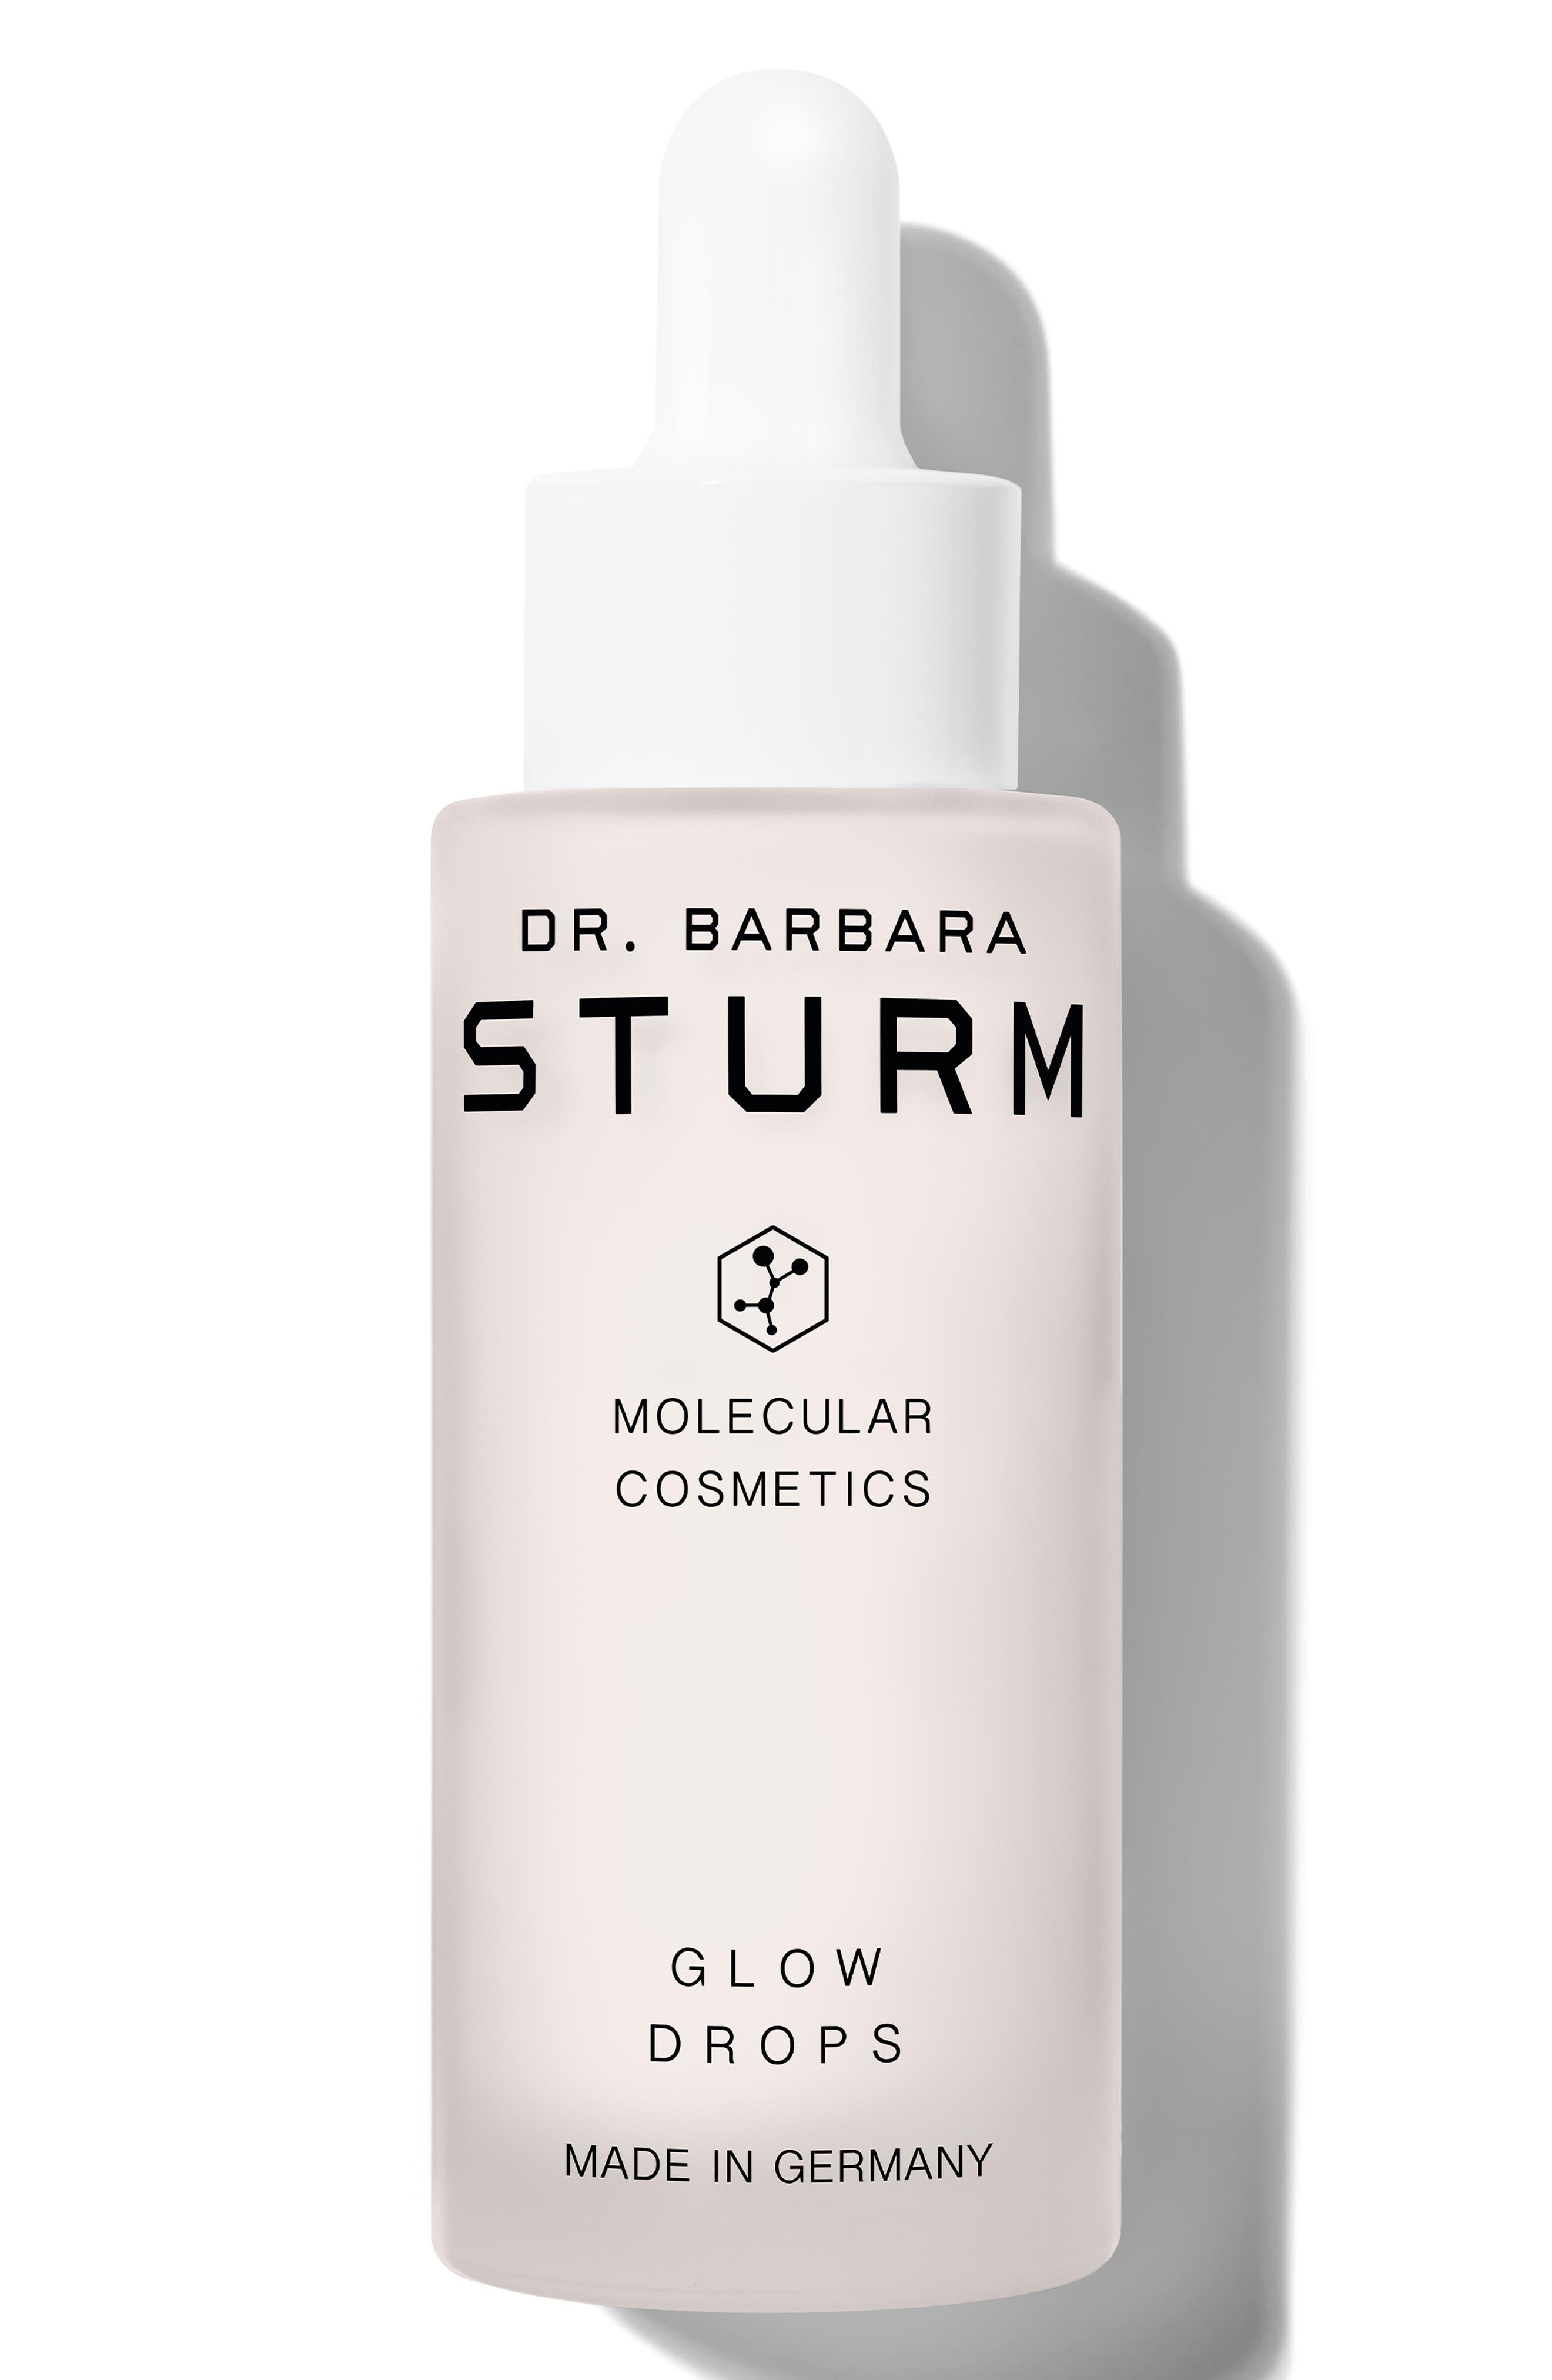 Dr. Barbara Sturm Glow Drops, Size 0.34 Oz in No Color at Nordstrom